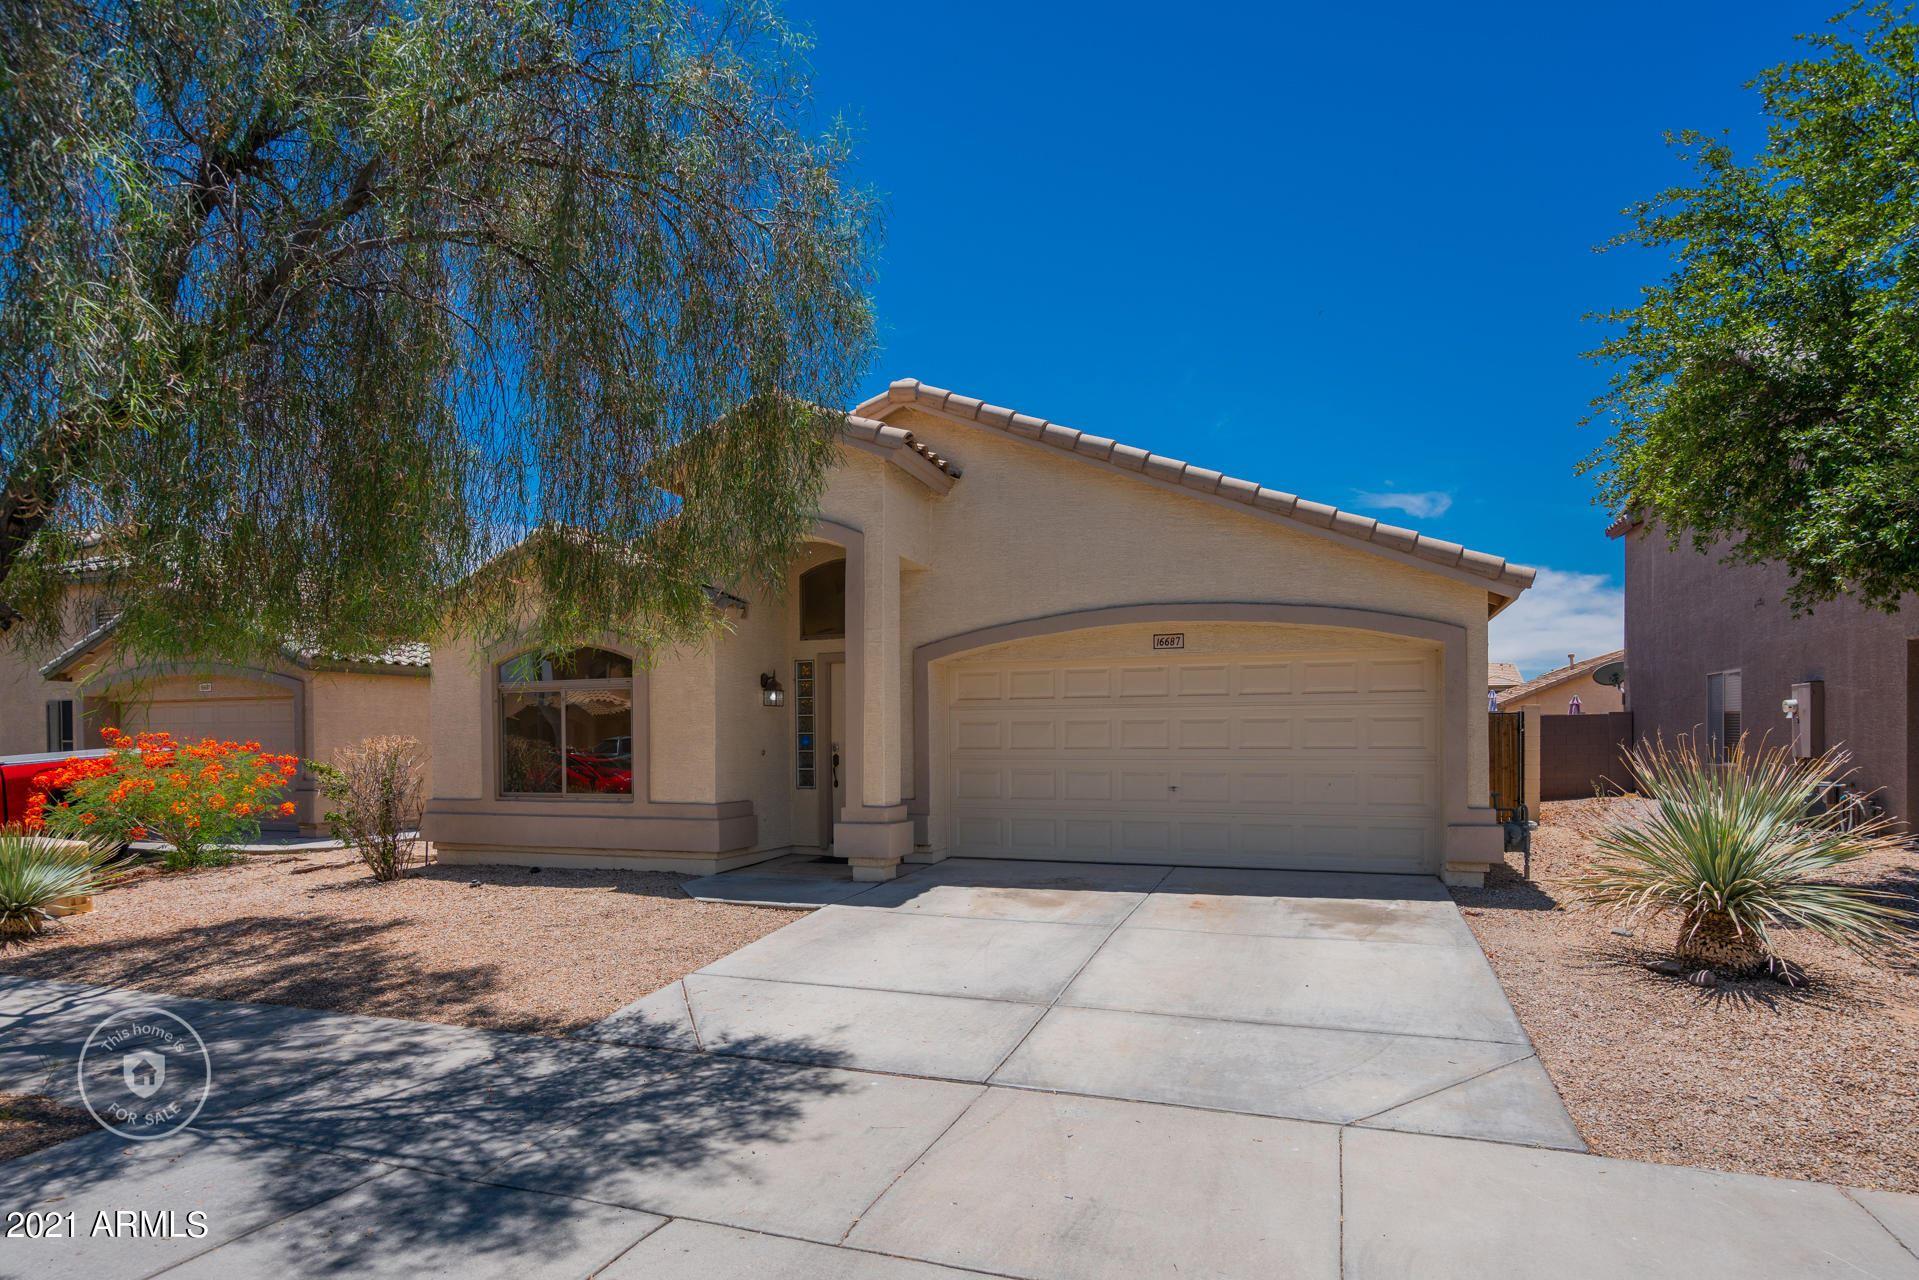 Photo of 16687 W CULVER Street, Goodyear, AZ 85338 (MLS # 6249387)